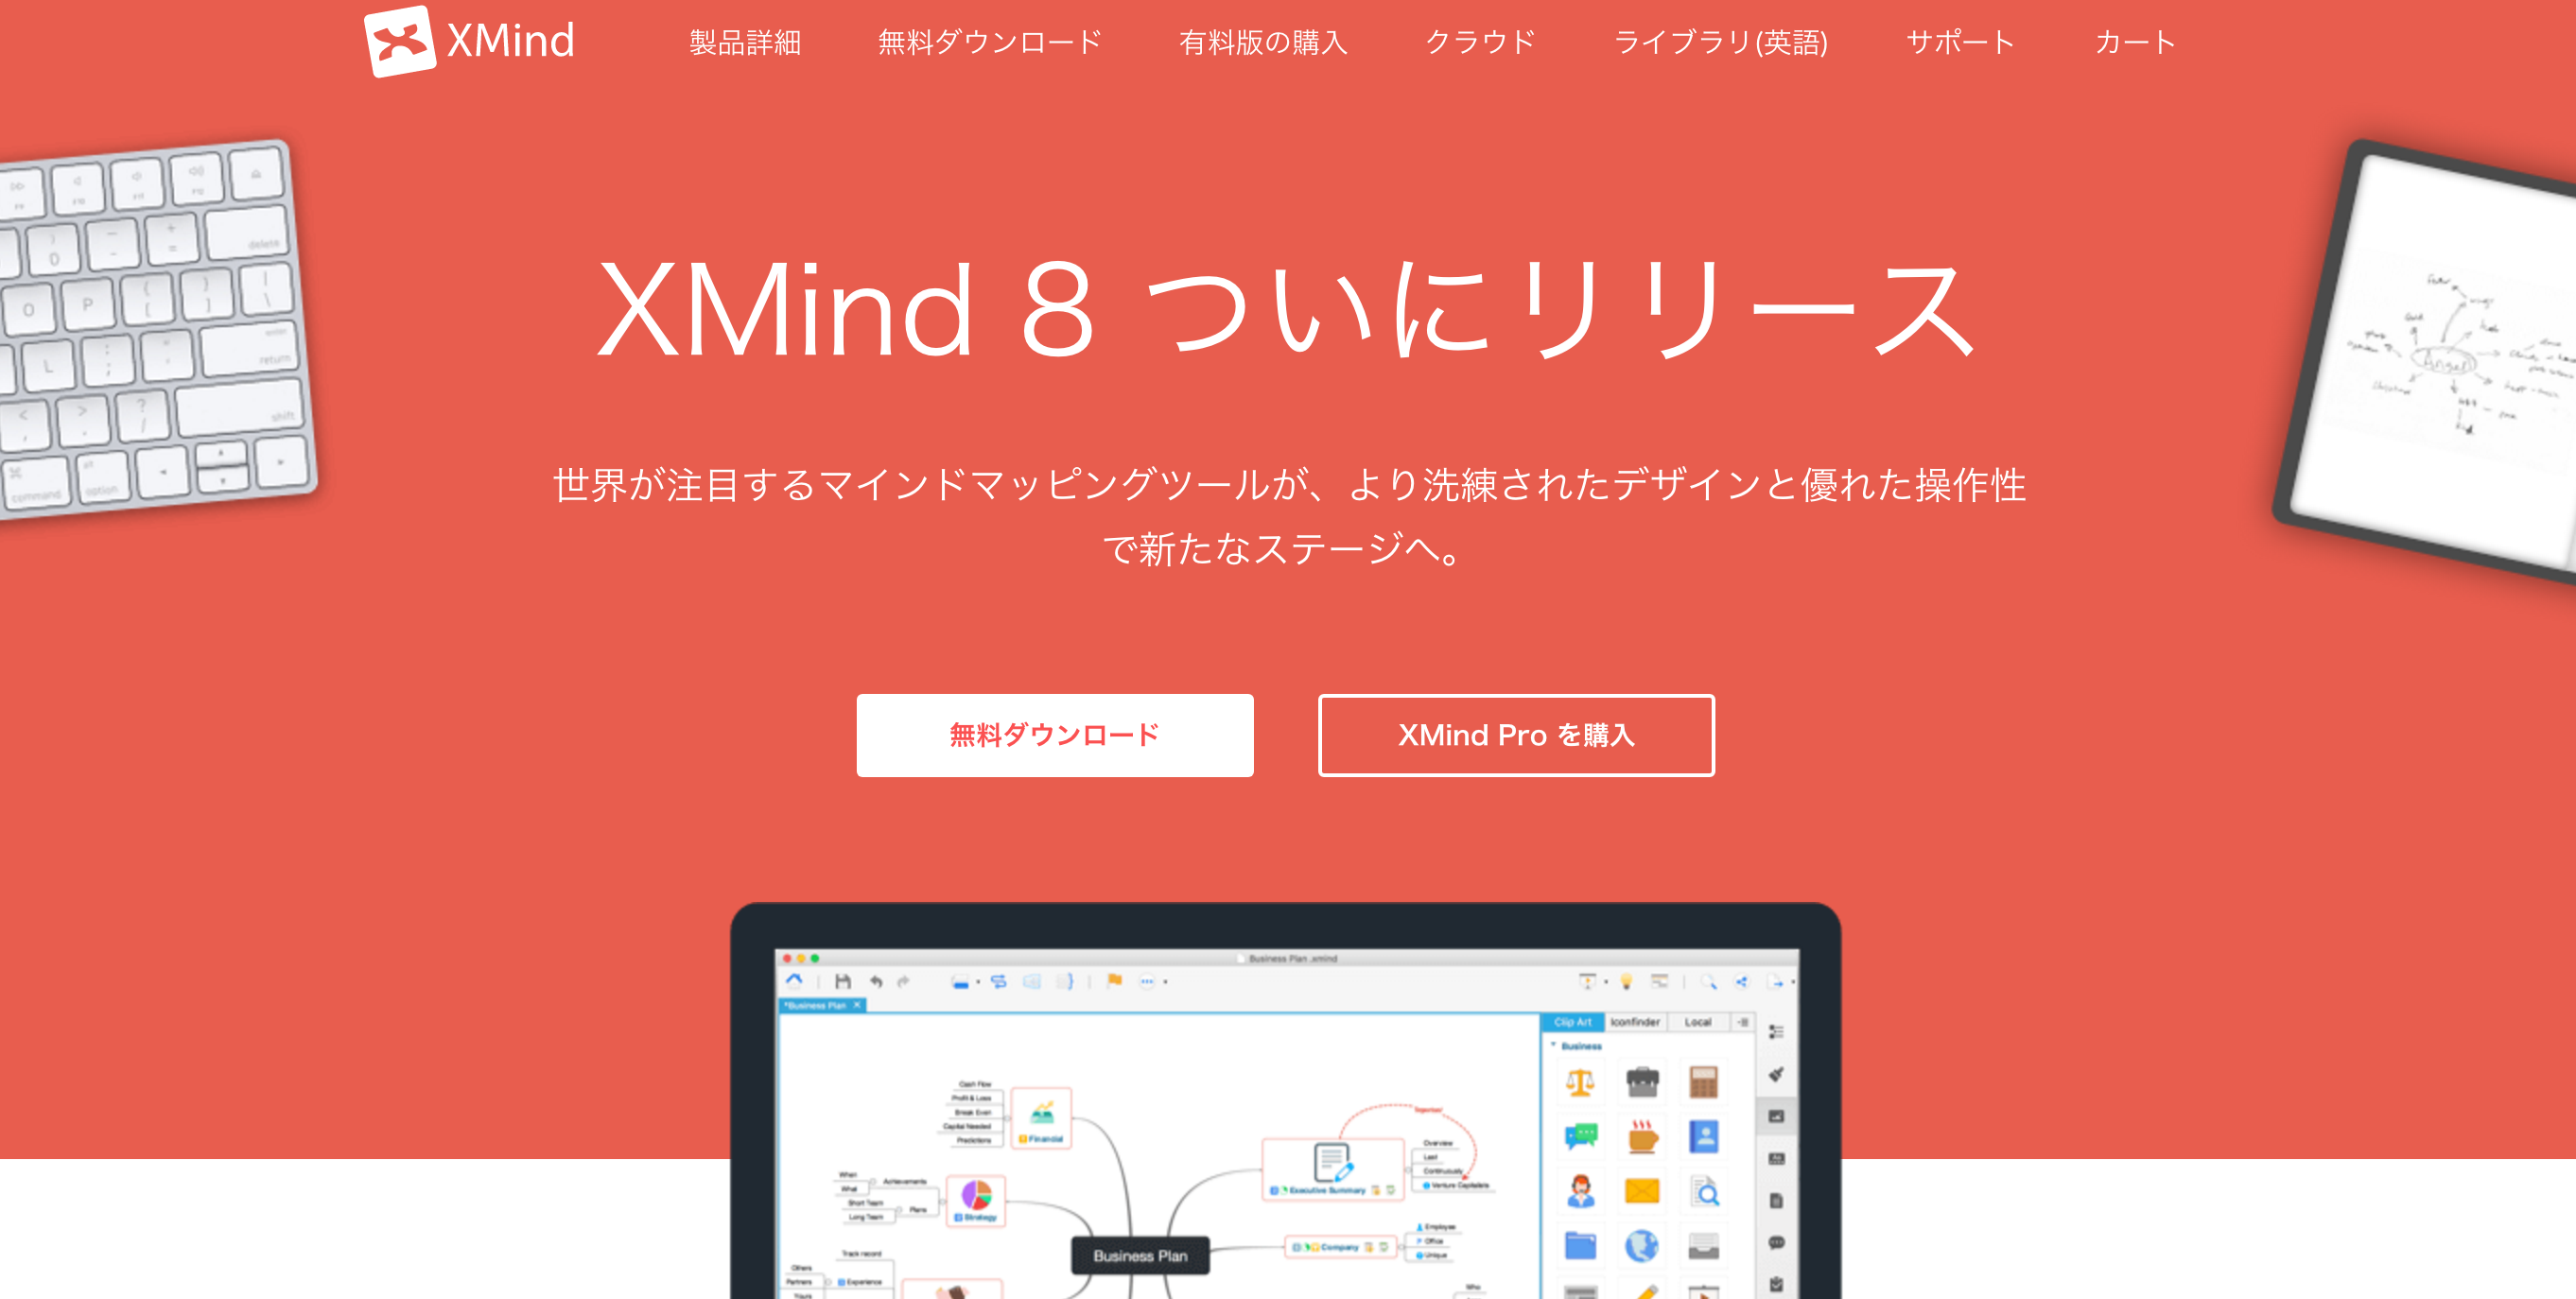 xmind - サイトマップをテンプレートを使って簡単に作成する方法